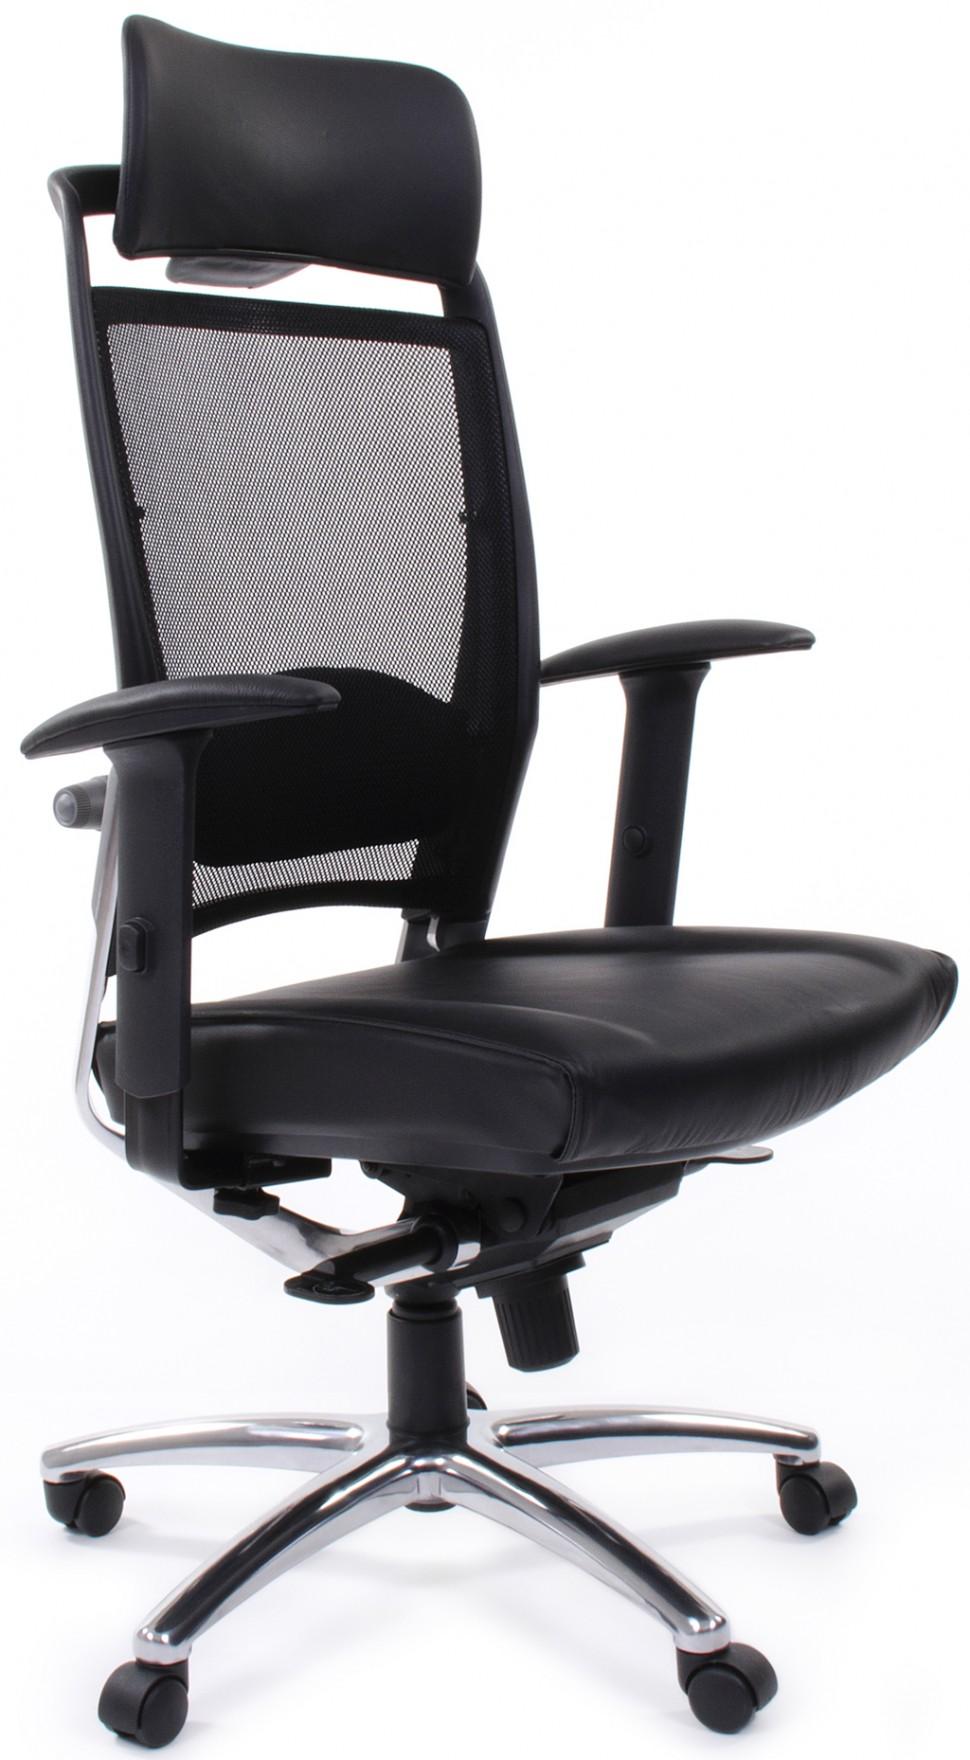 Кресло из кожи и сетки